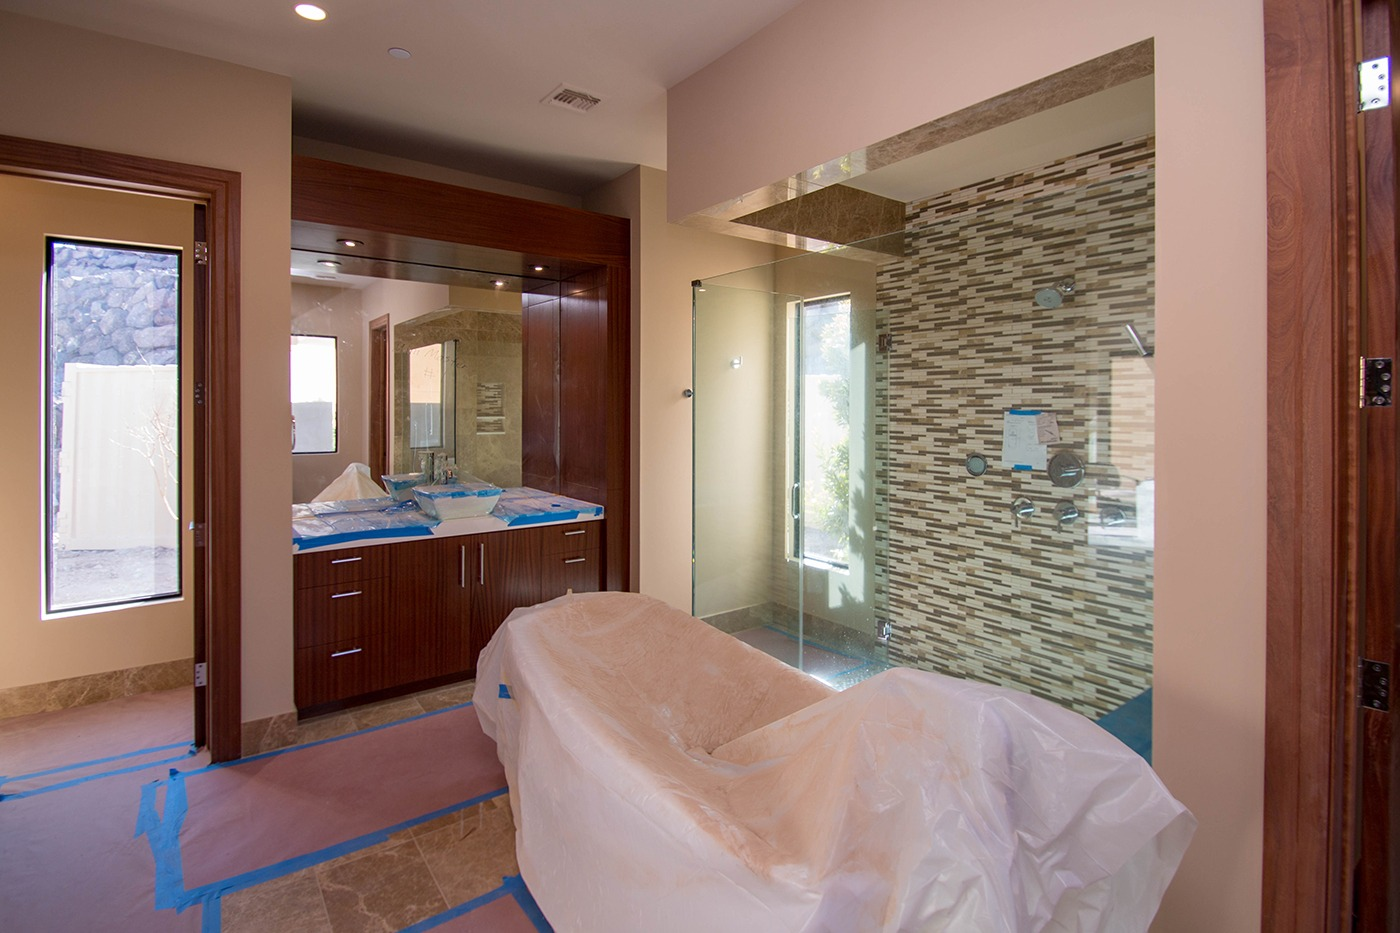 A beautiful custom glass shower door mirror system ascaya a beautiful custom glass shower door mirror system ascaya residential home in henderson nevada planetlyrics Choice Image